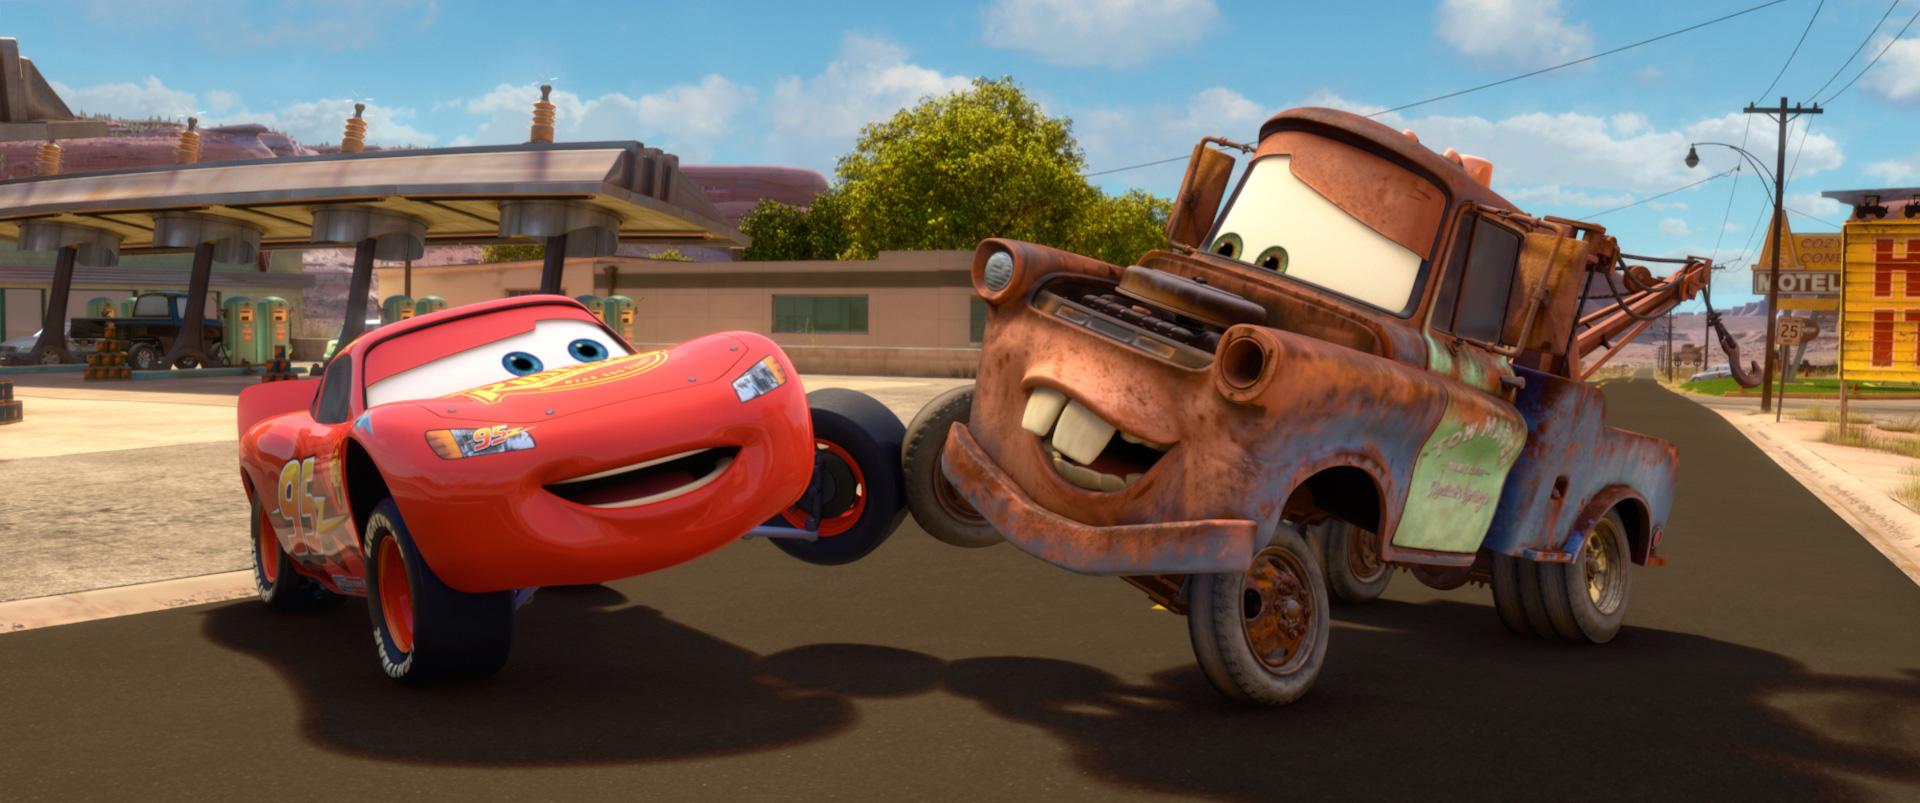 Mater/Relationships